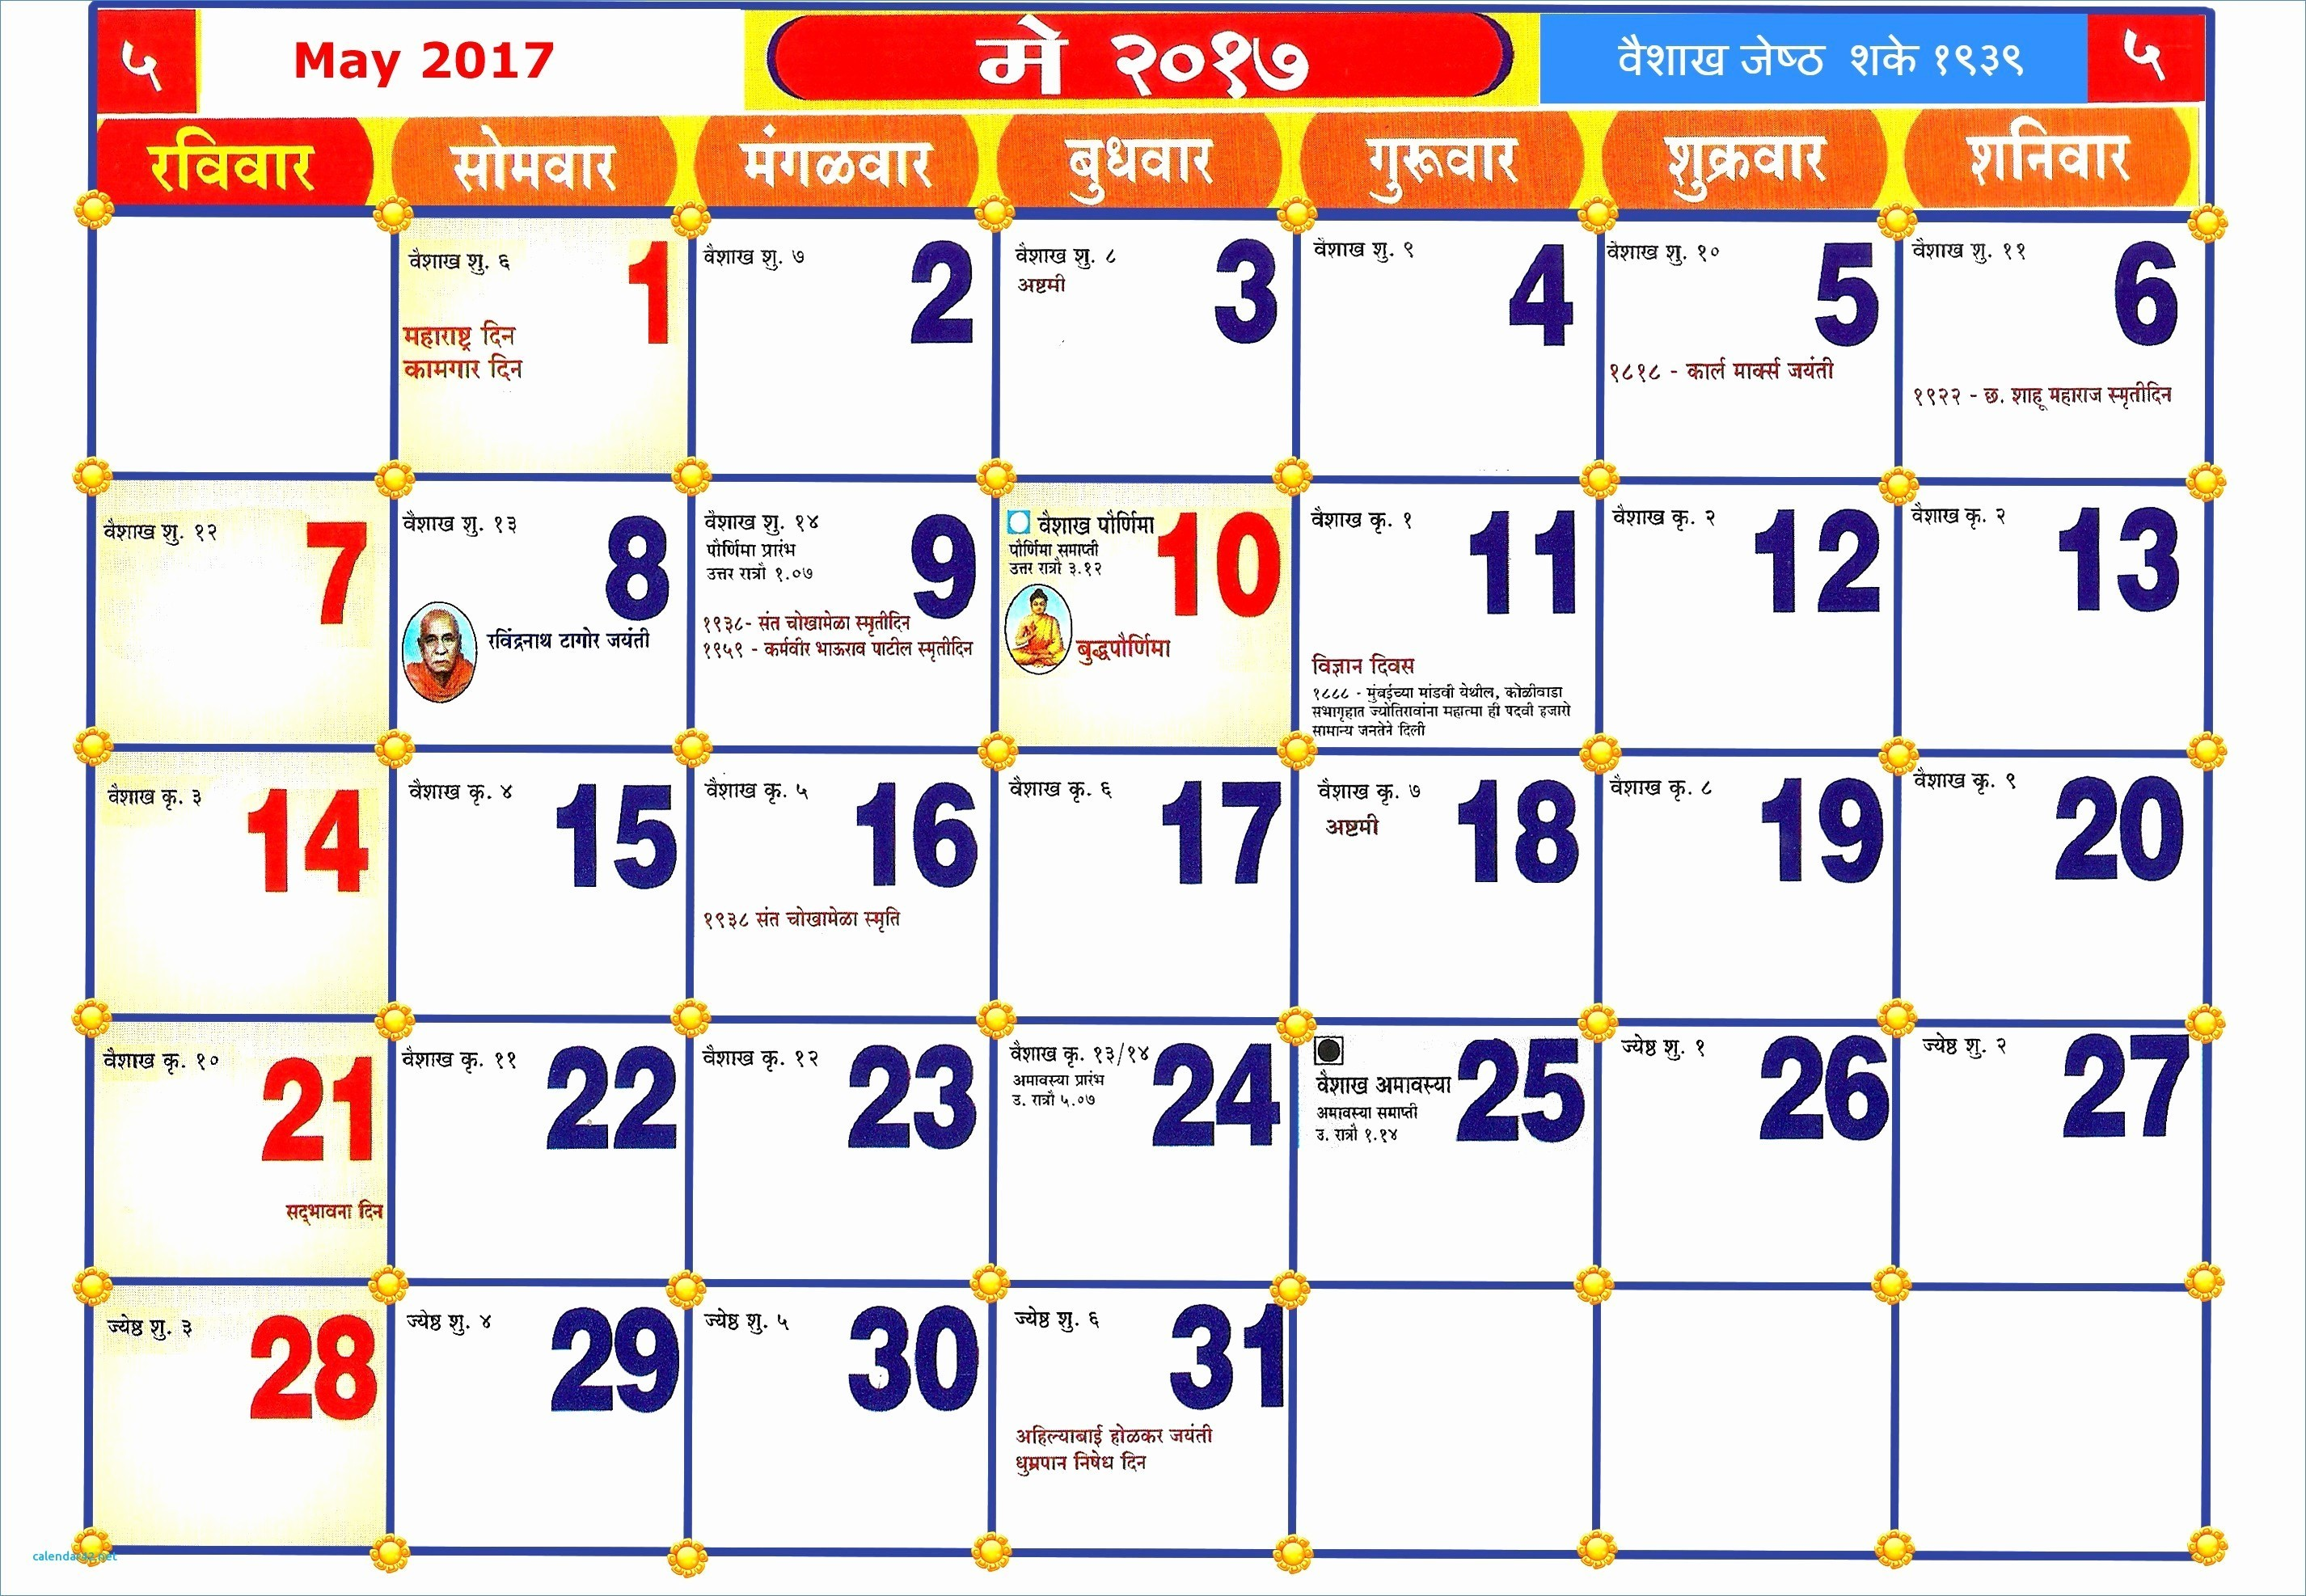 Calendario Enero 2019 Para Imprimir A4 Más Recientes Verificar Kalender 2019 Pdf Din A3 Calendario 2019 Of Calendario Enero 2019 Para Imprimir A4 Más Arriba-a-fecha Calendario Abril 2019 Para Imprimir T